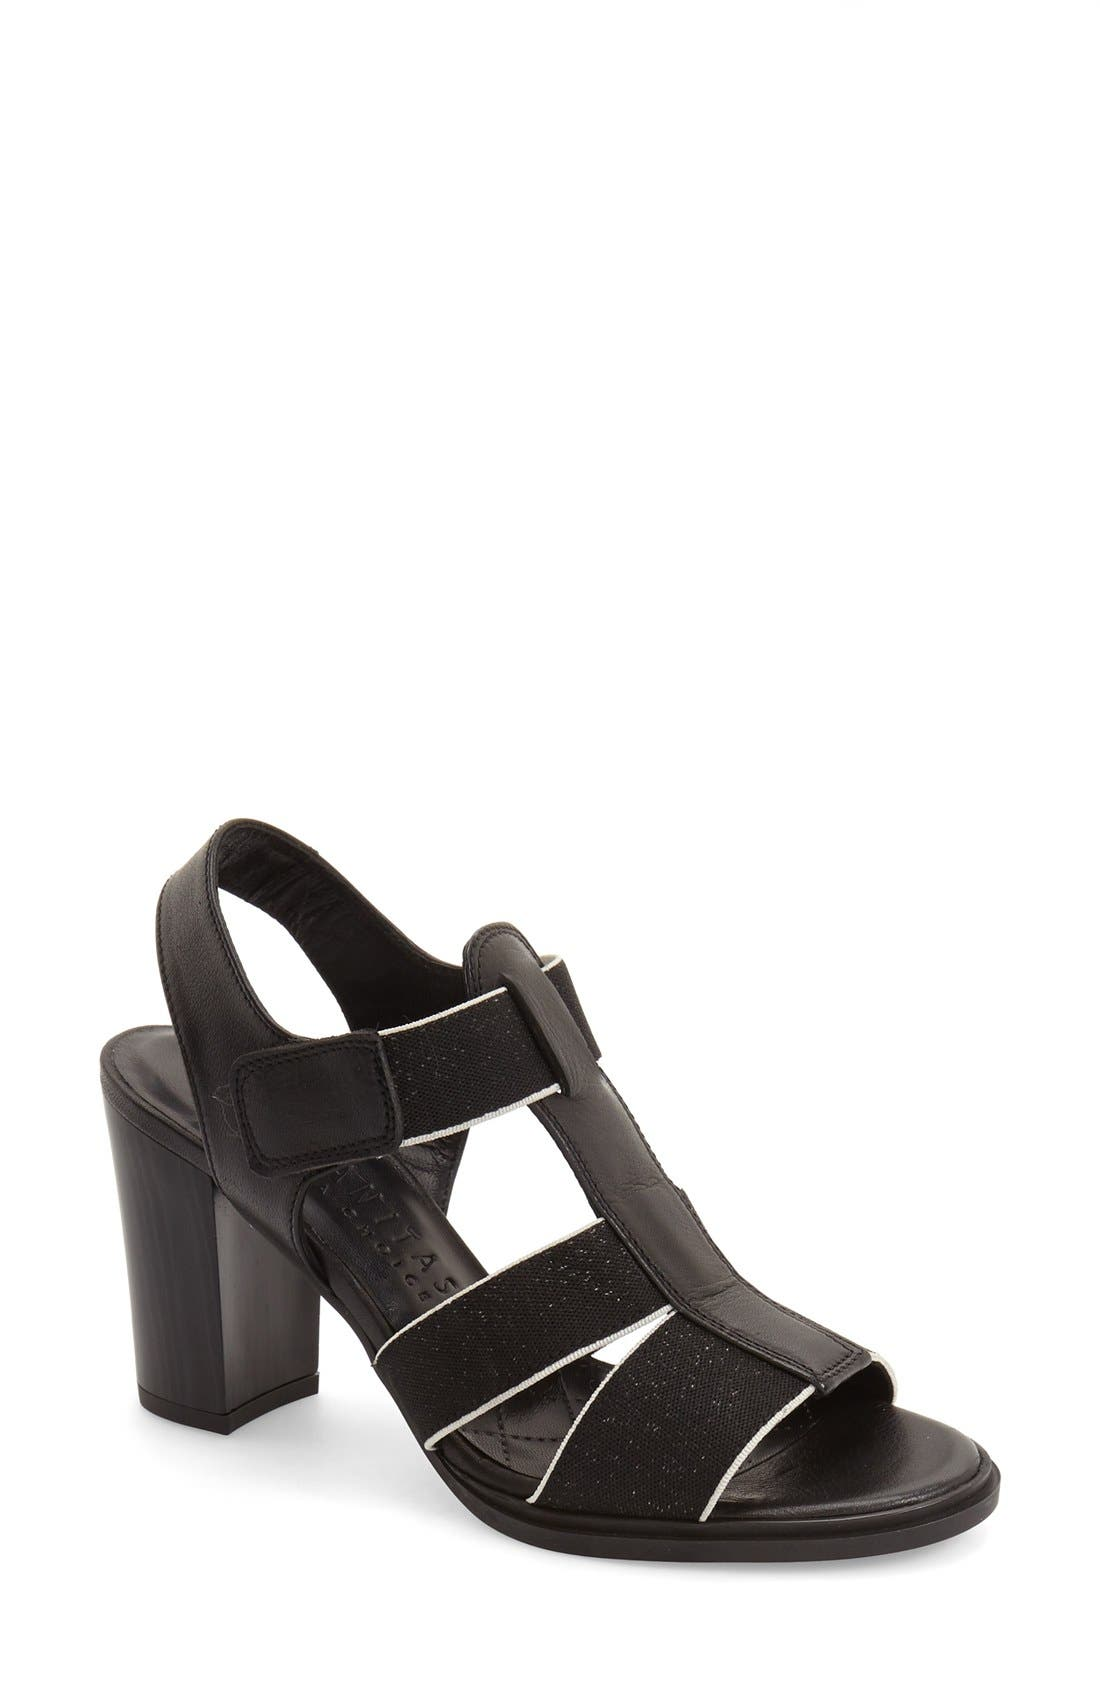 'Matchless' Sandal,                         Main,                         color, Black Leather